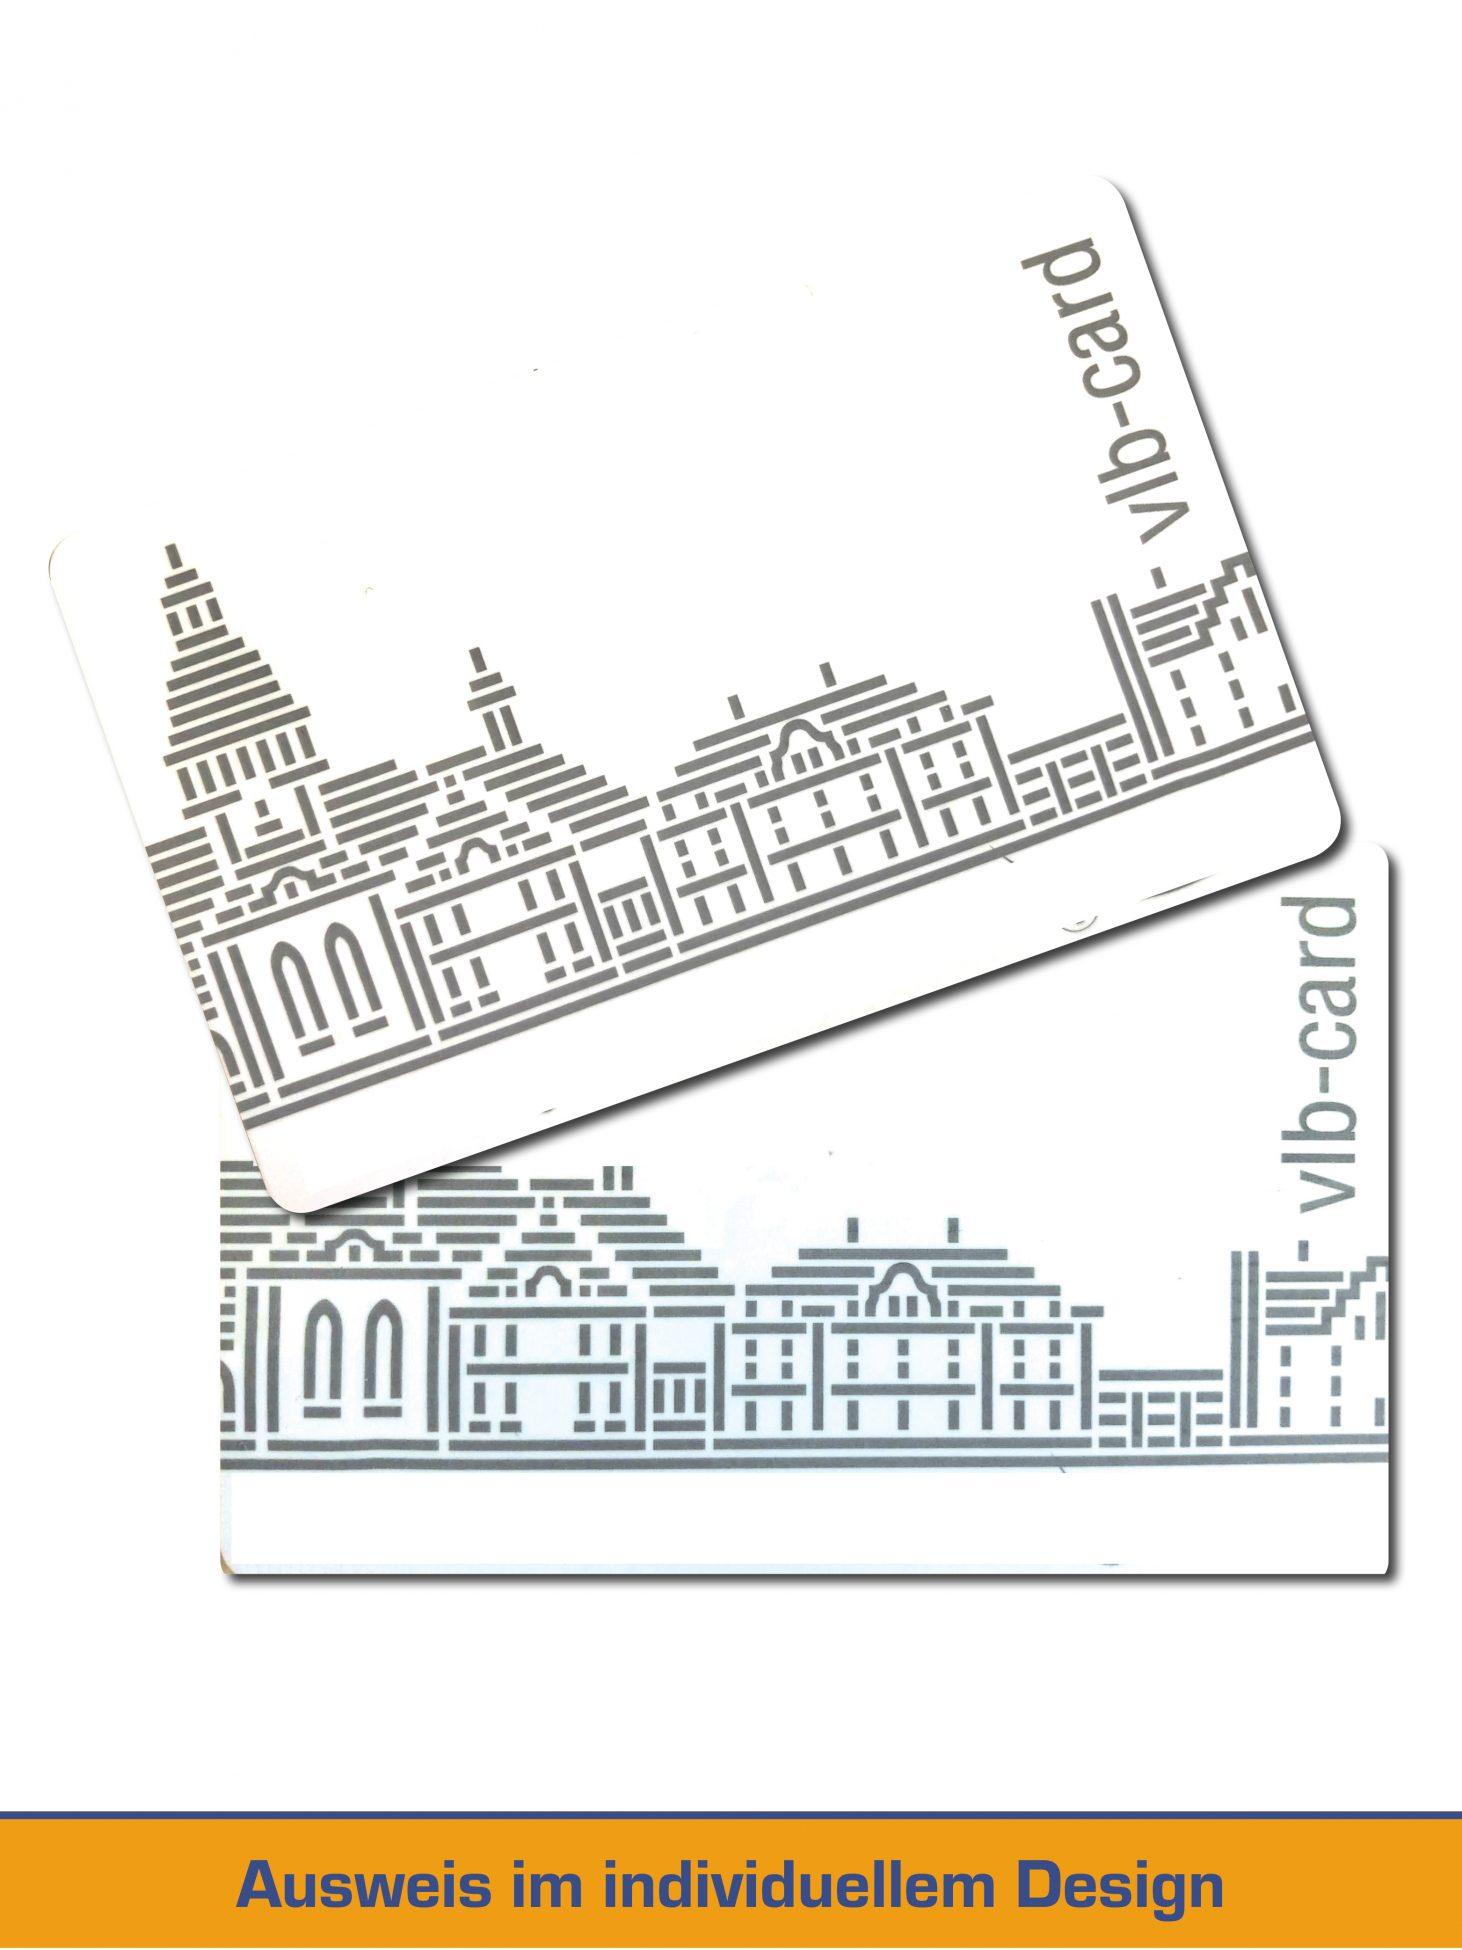 Bibliothausweis im individuellem Design / Artwork